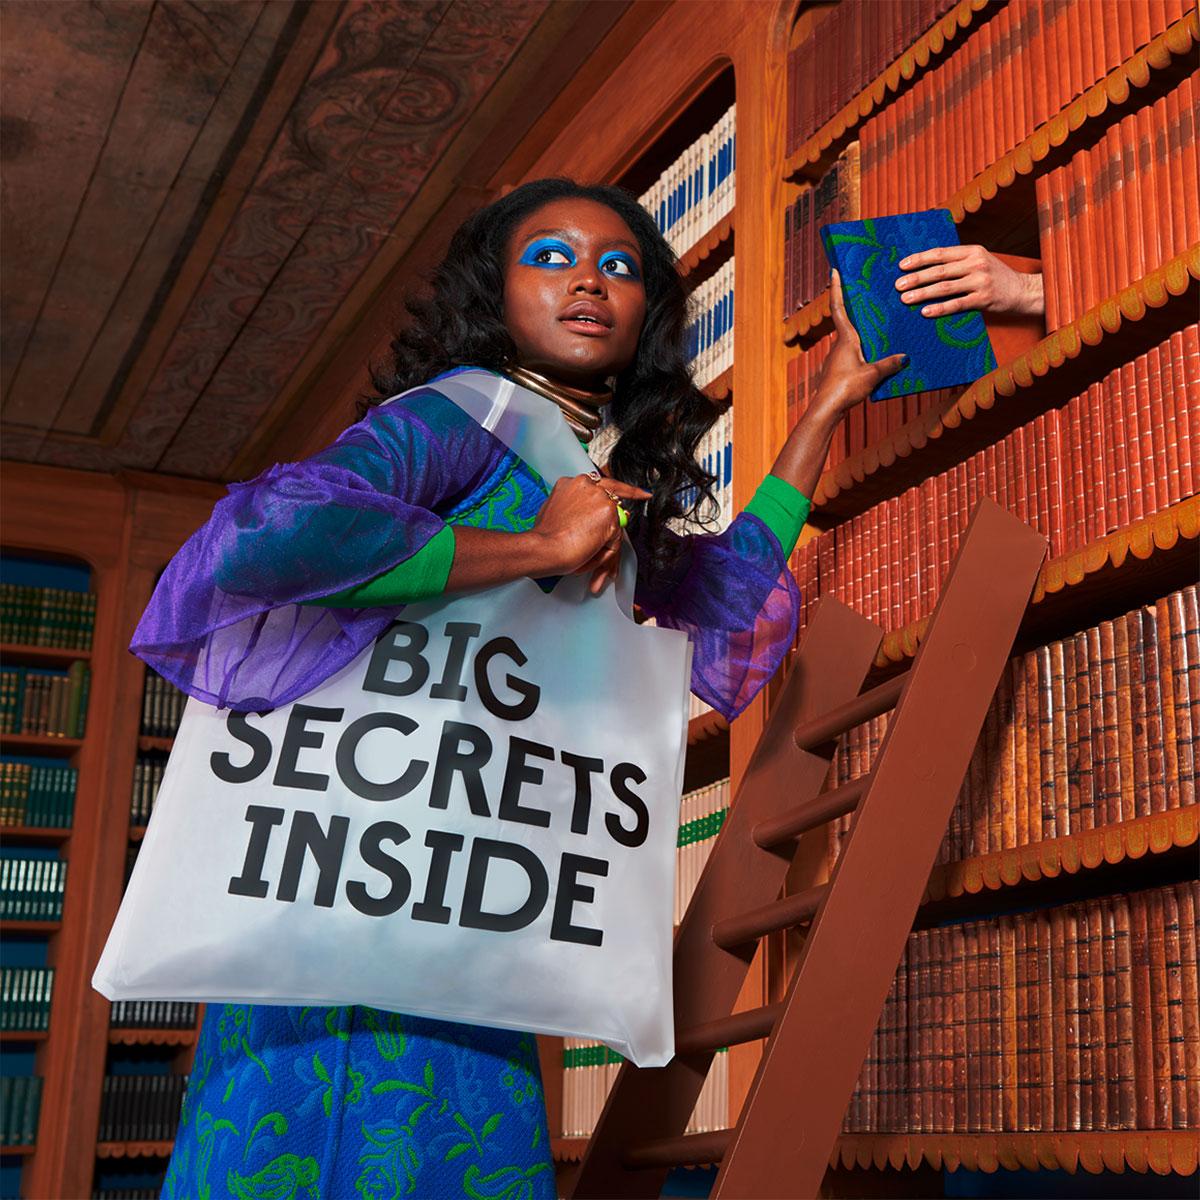 210412-LOQI-transparent-secret-and-classified-bag